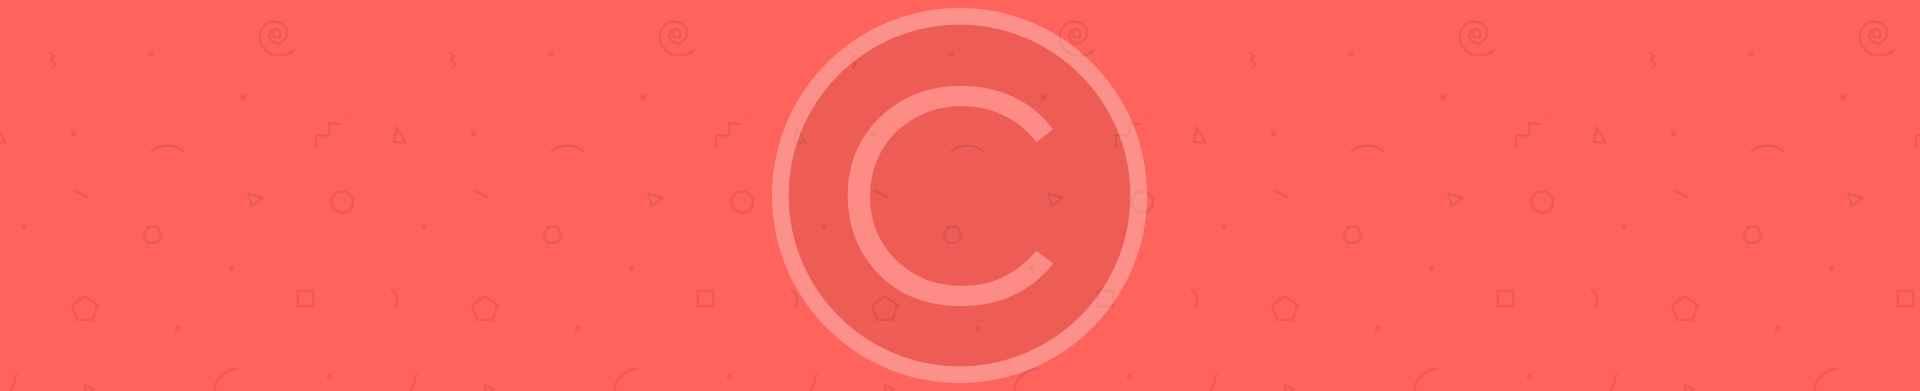 Rectangle-6-copy.jpg